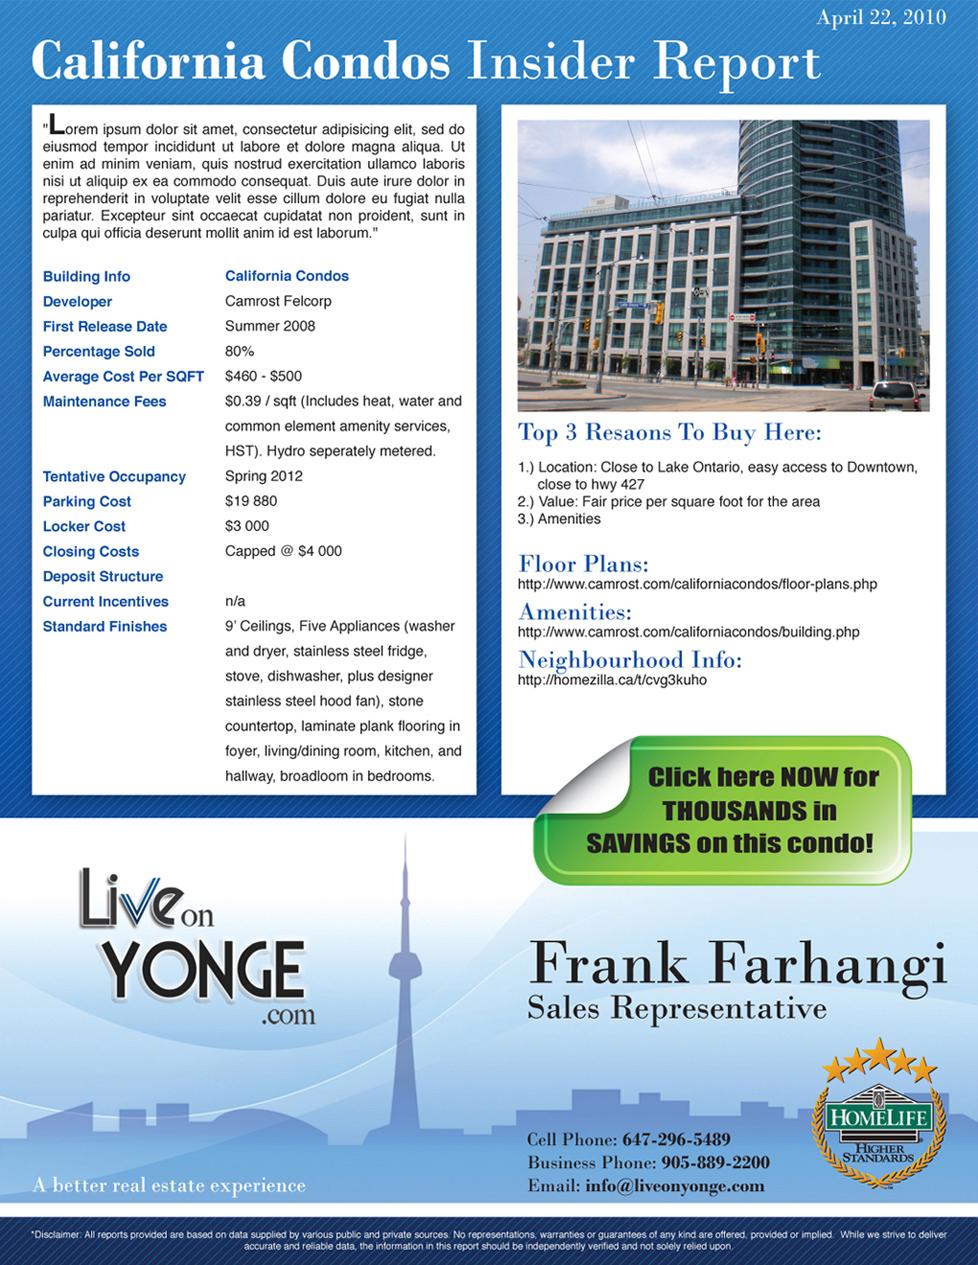 Portfolio image for Frank Farhangi